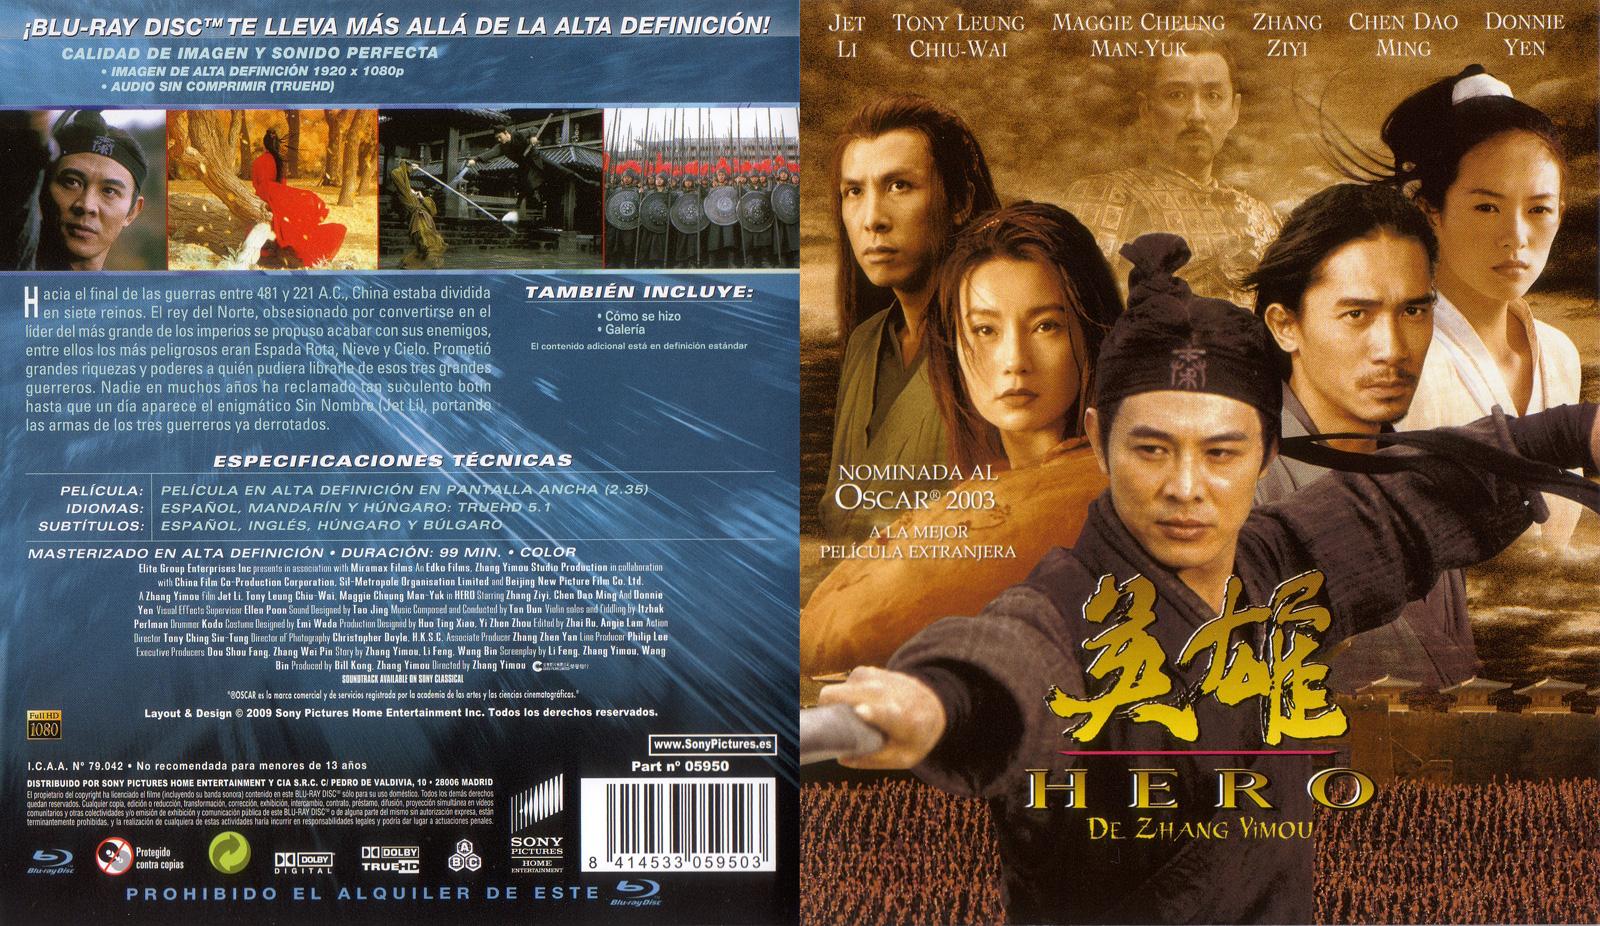 Sony september 29 2009 blu ray region source ahsoka audio mandarin